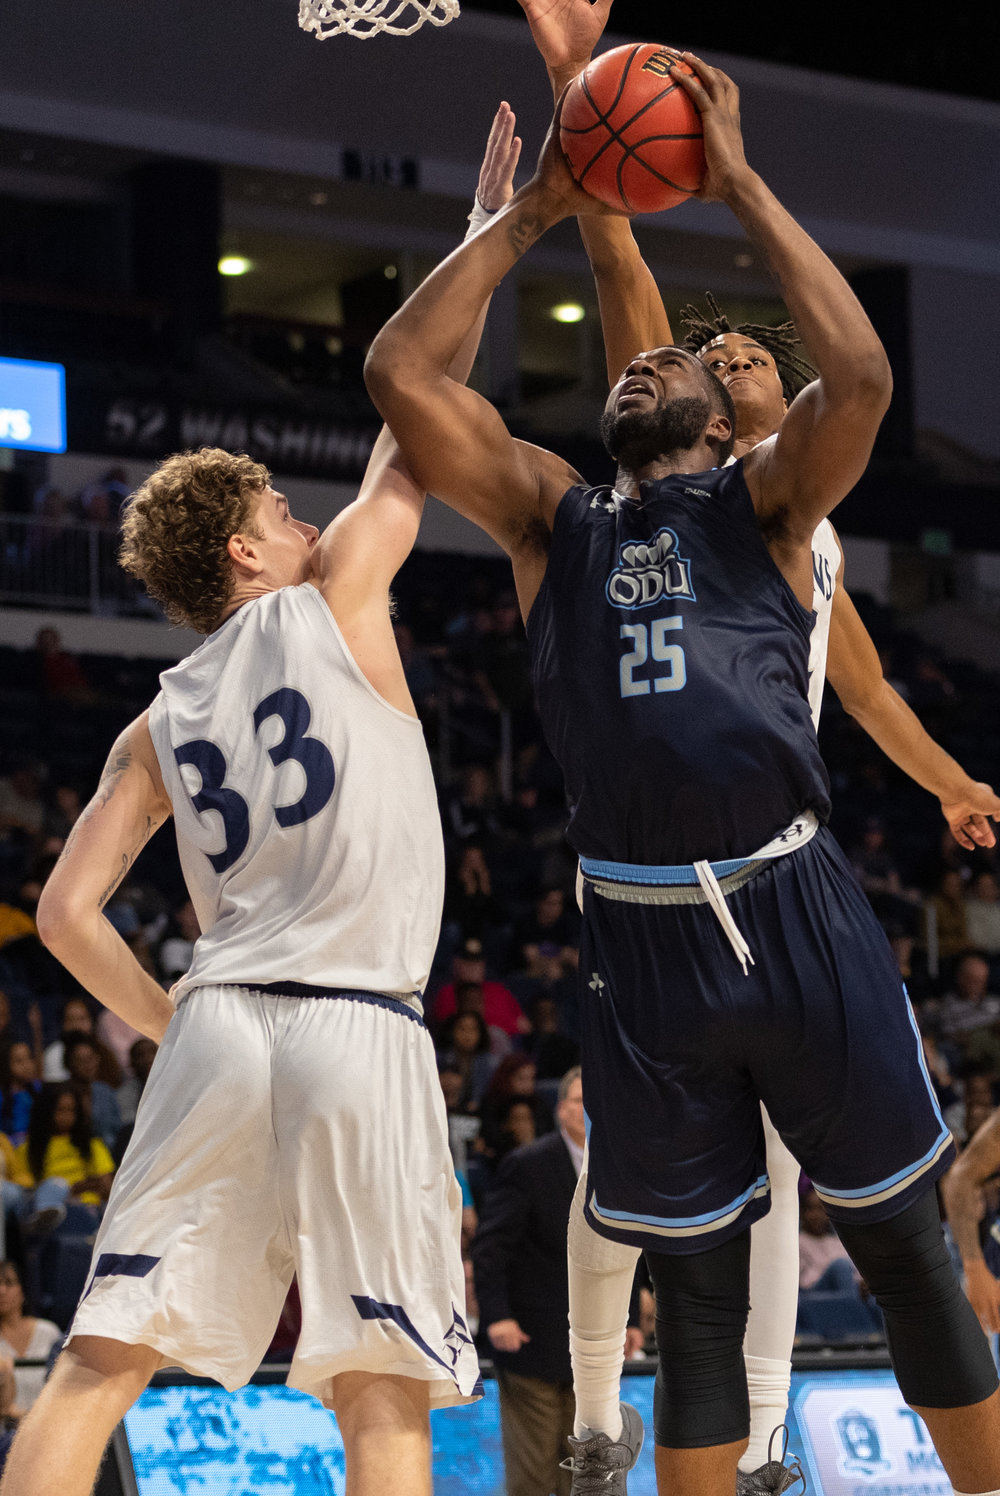 Mens Basketball: Virginia Wesleyan vs Old Dominion